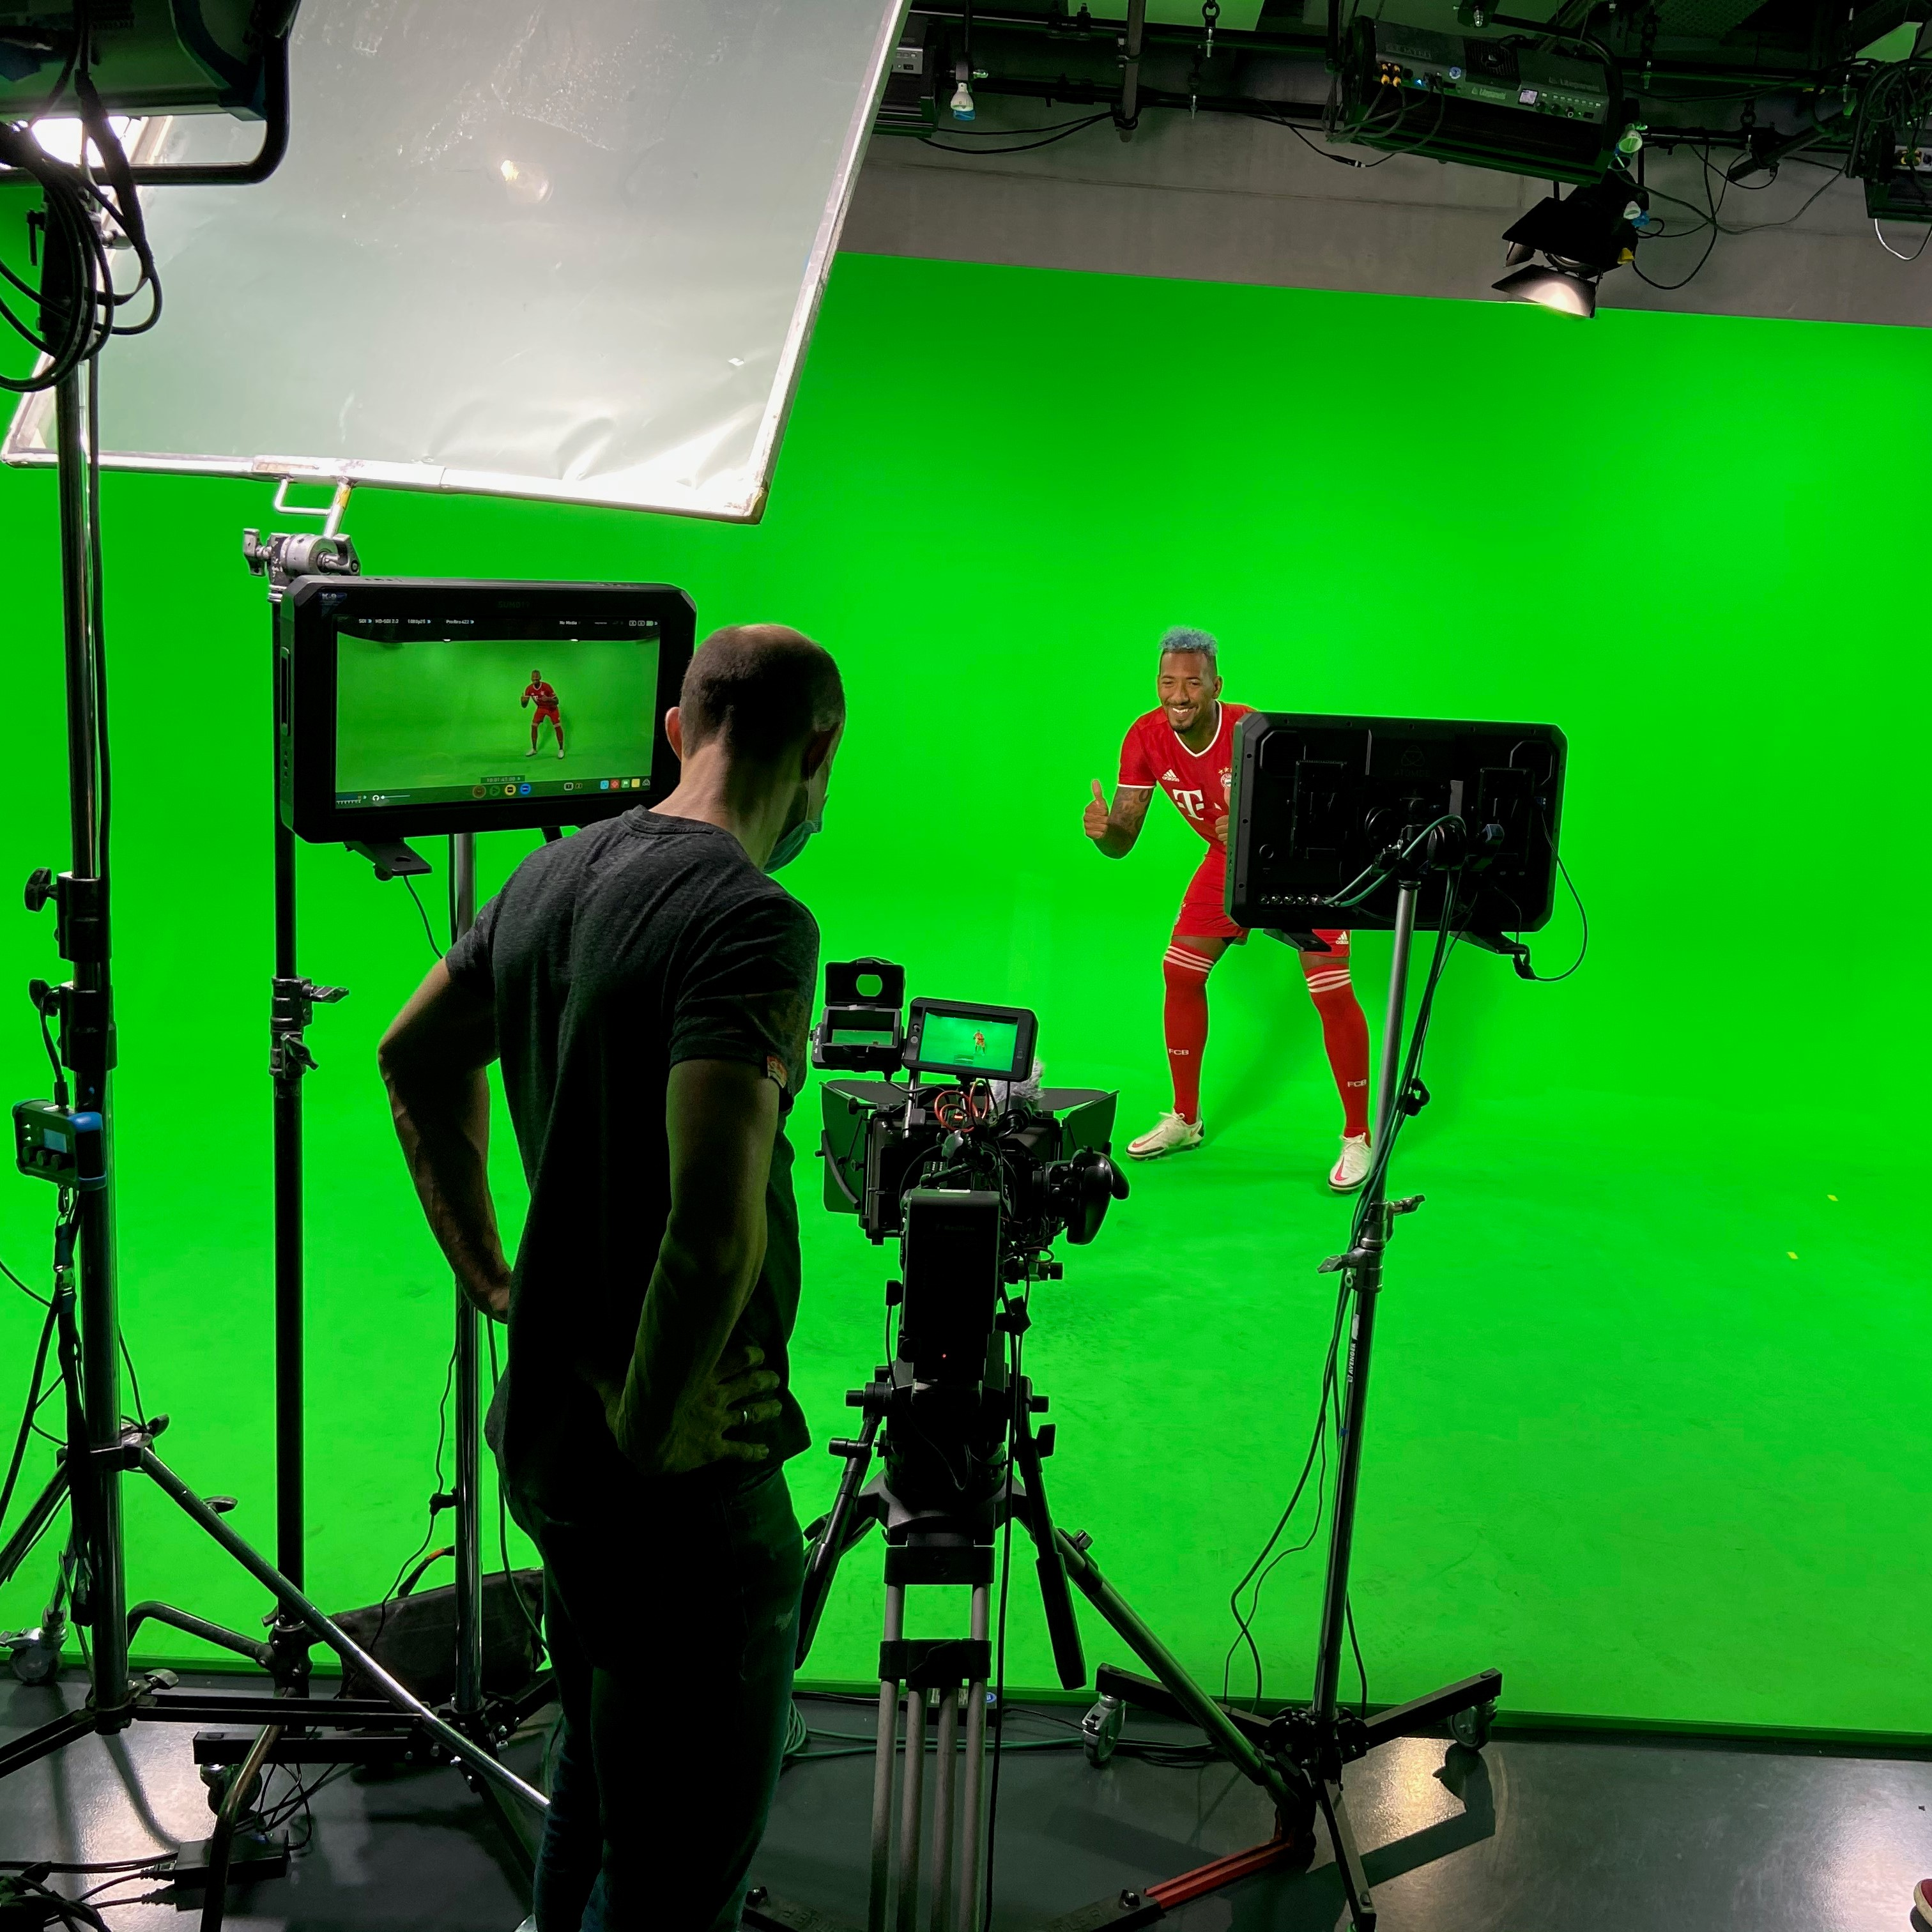 Professionelle green Screen Produktion für Augmented Reality Projekte.